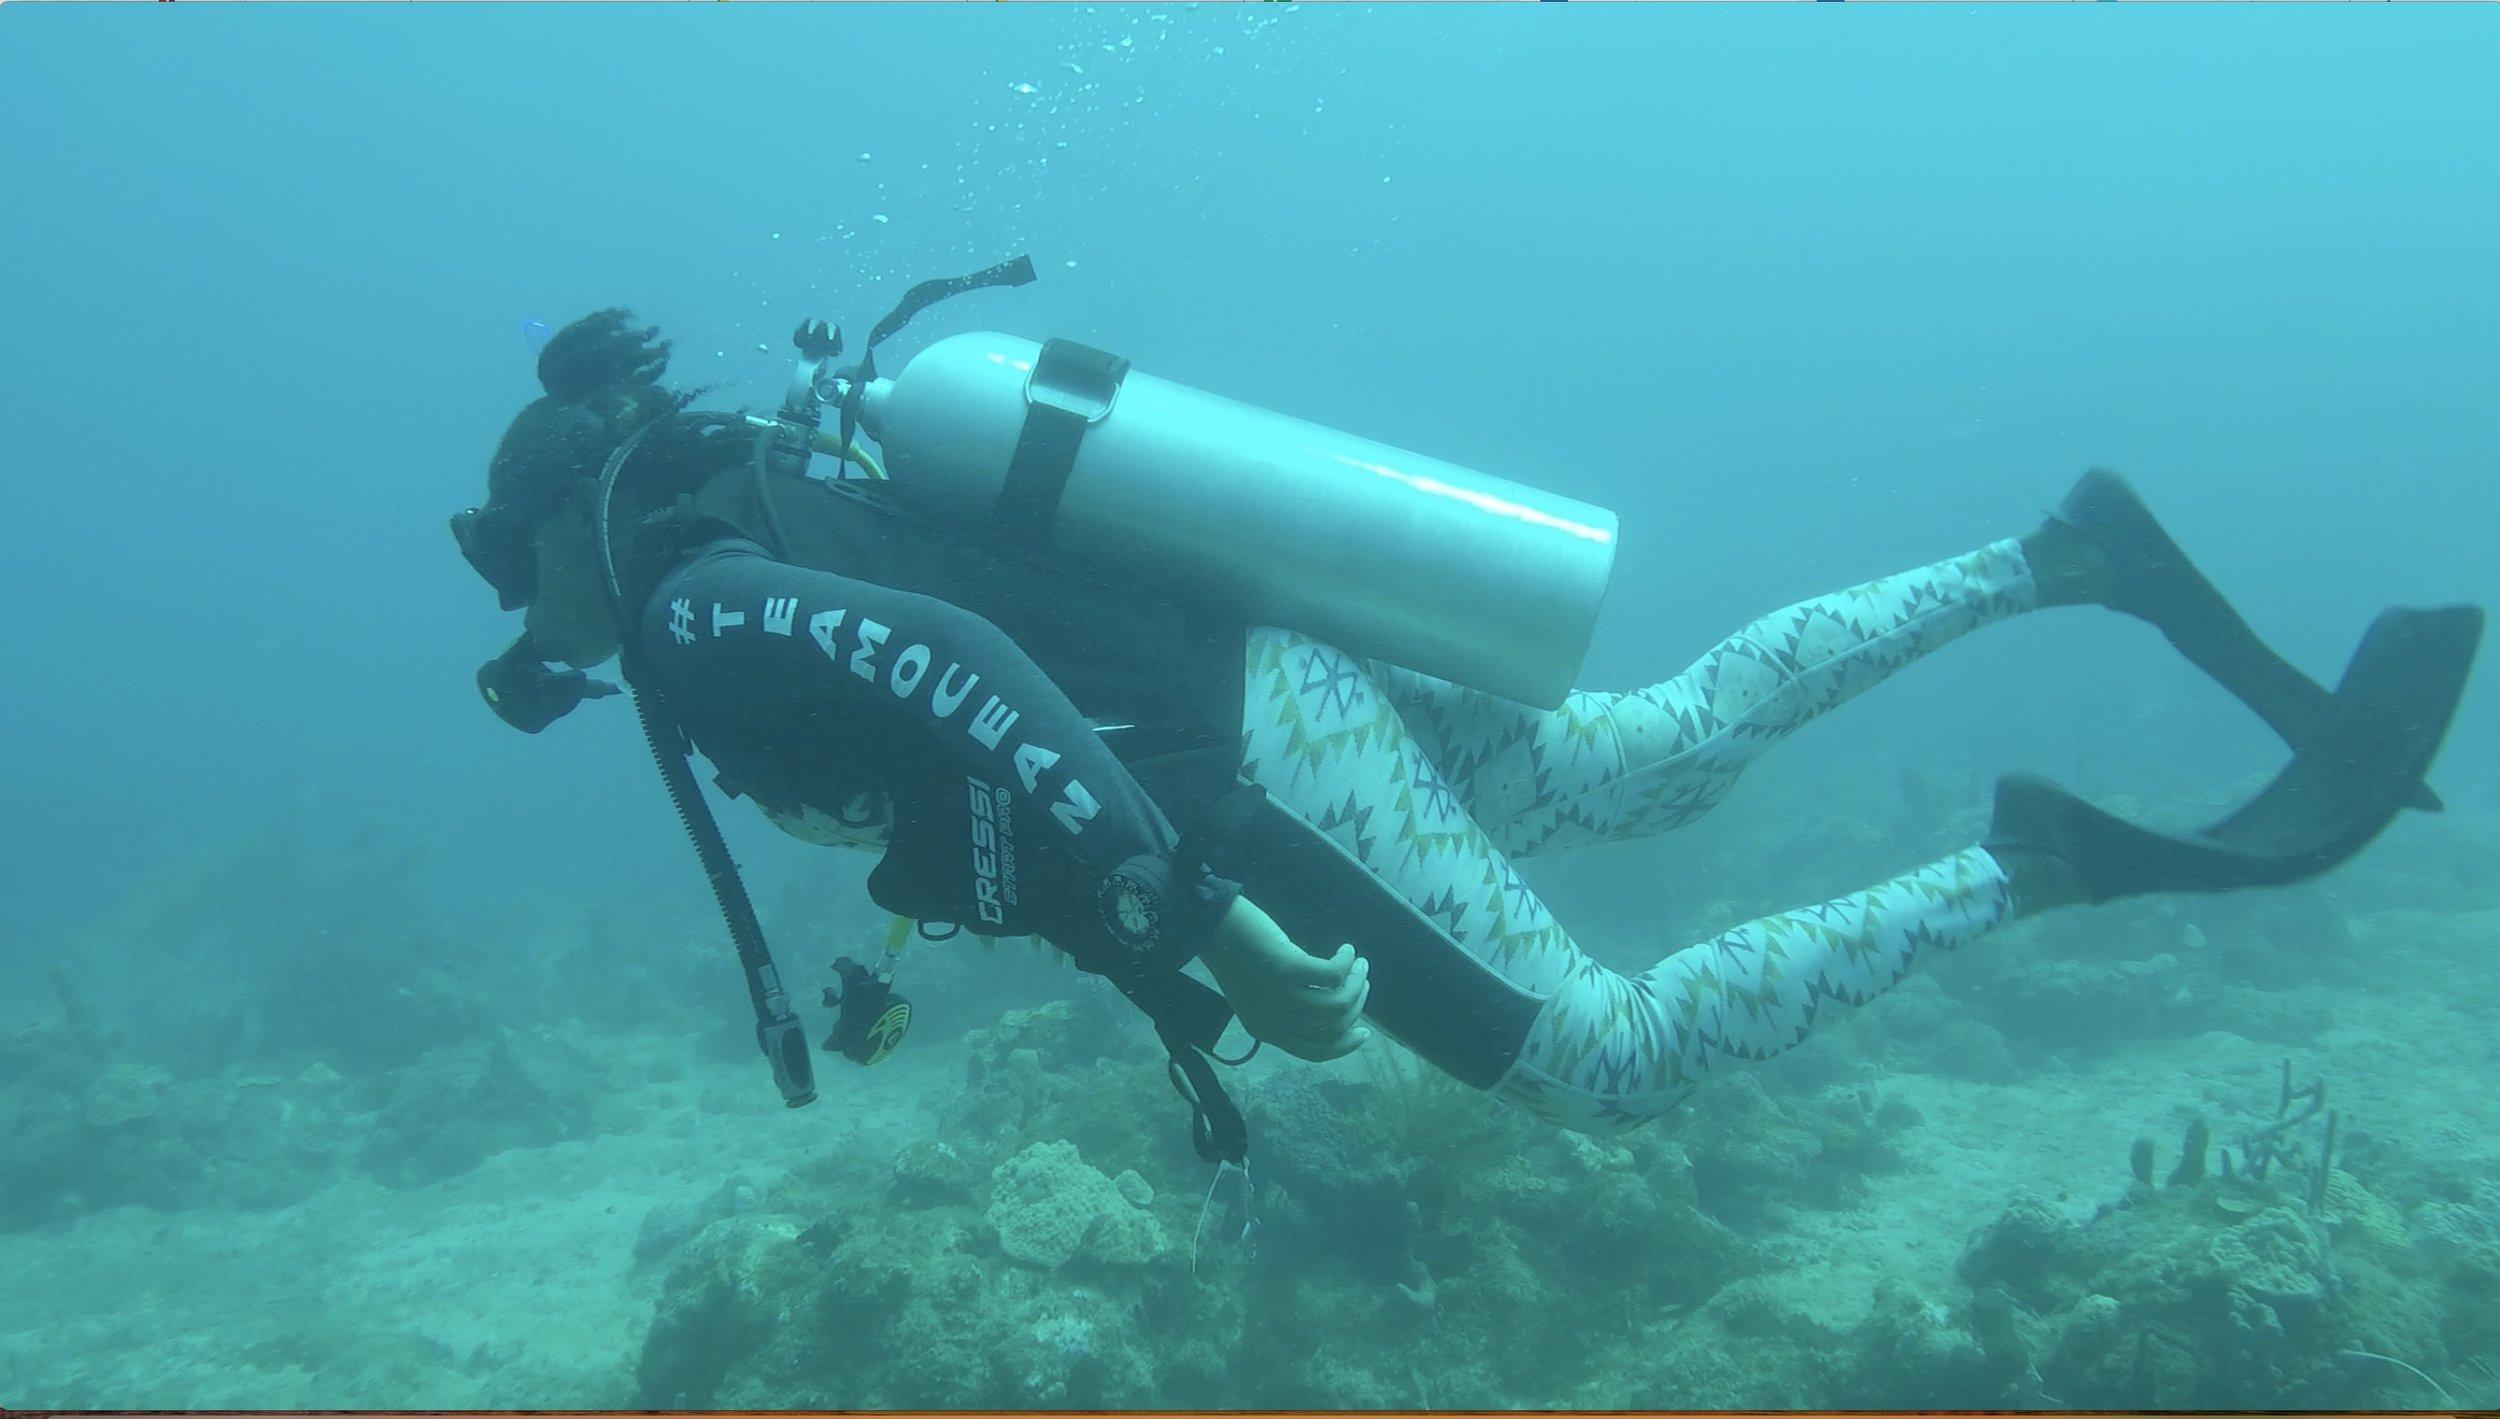 alisha scuba diving salt domnica team ocean learn to dive padi certification.jpeg